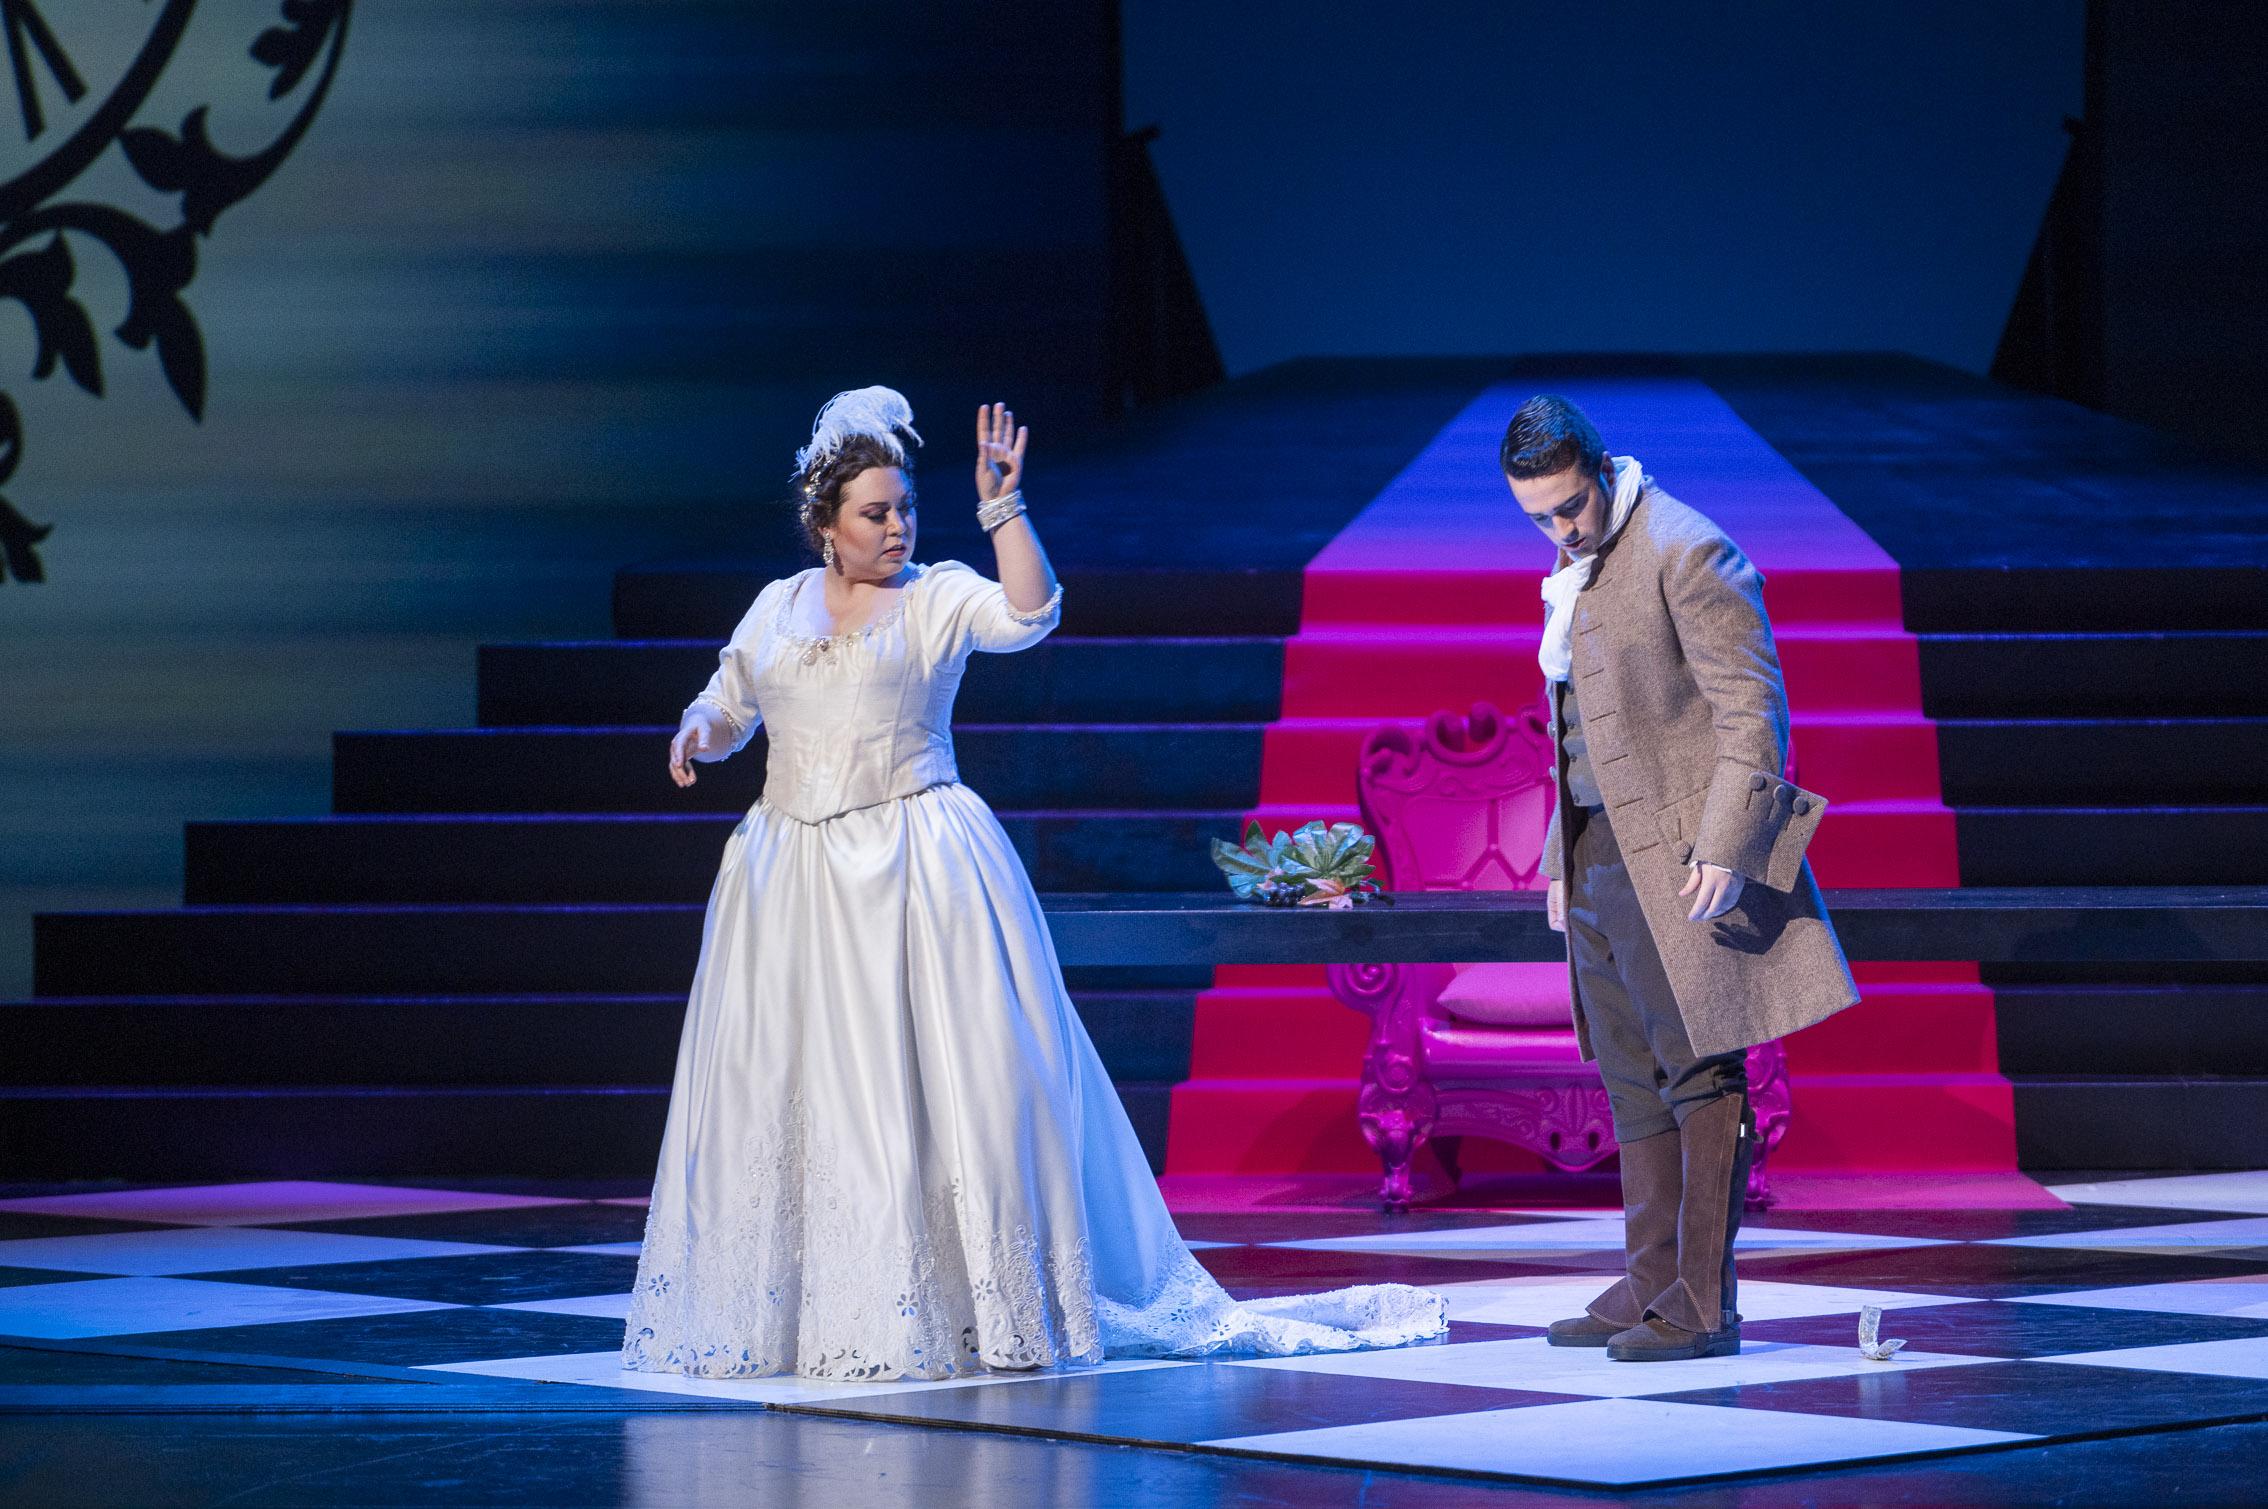 foto: Nacho González / Opera de Las Palmas